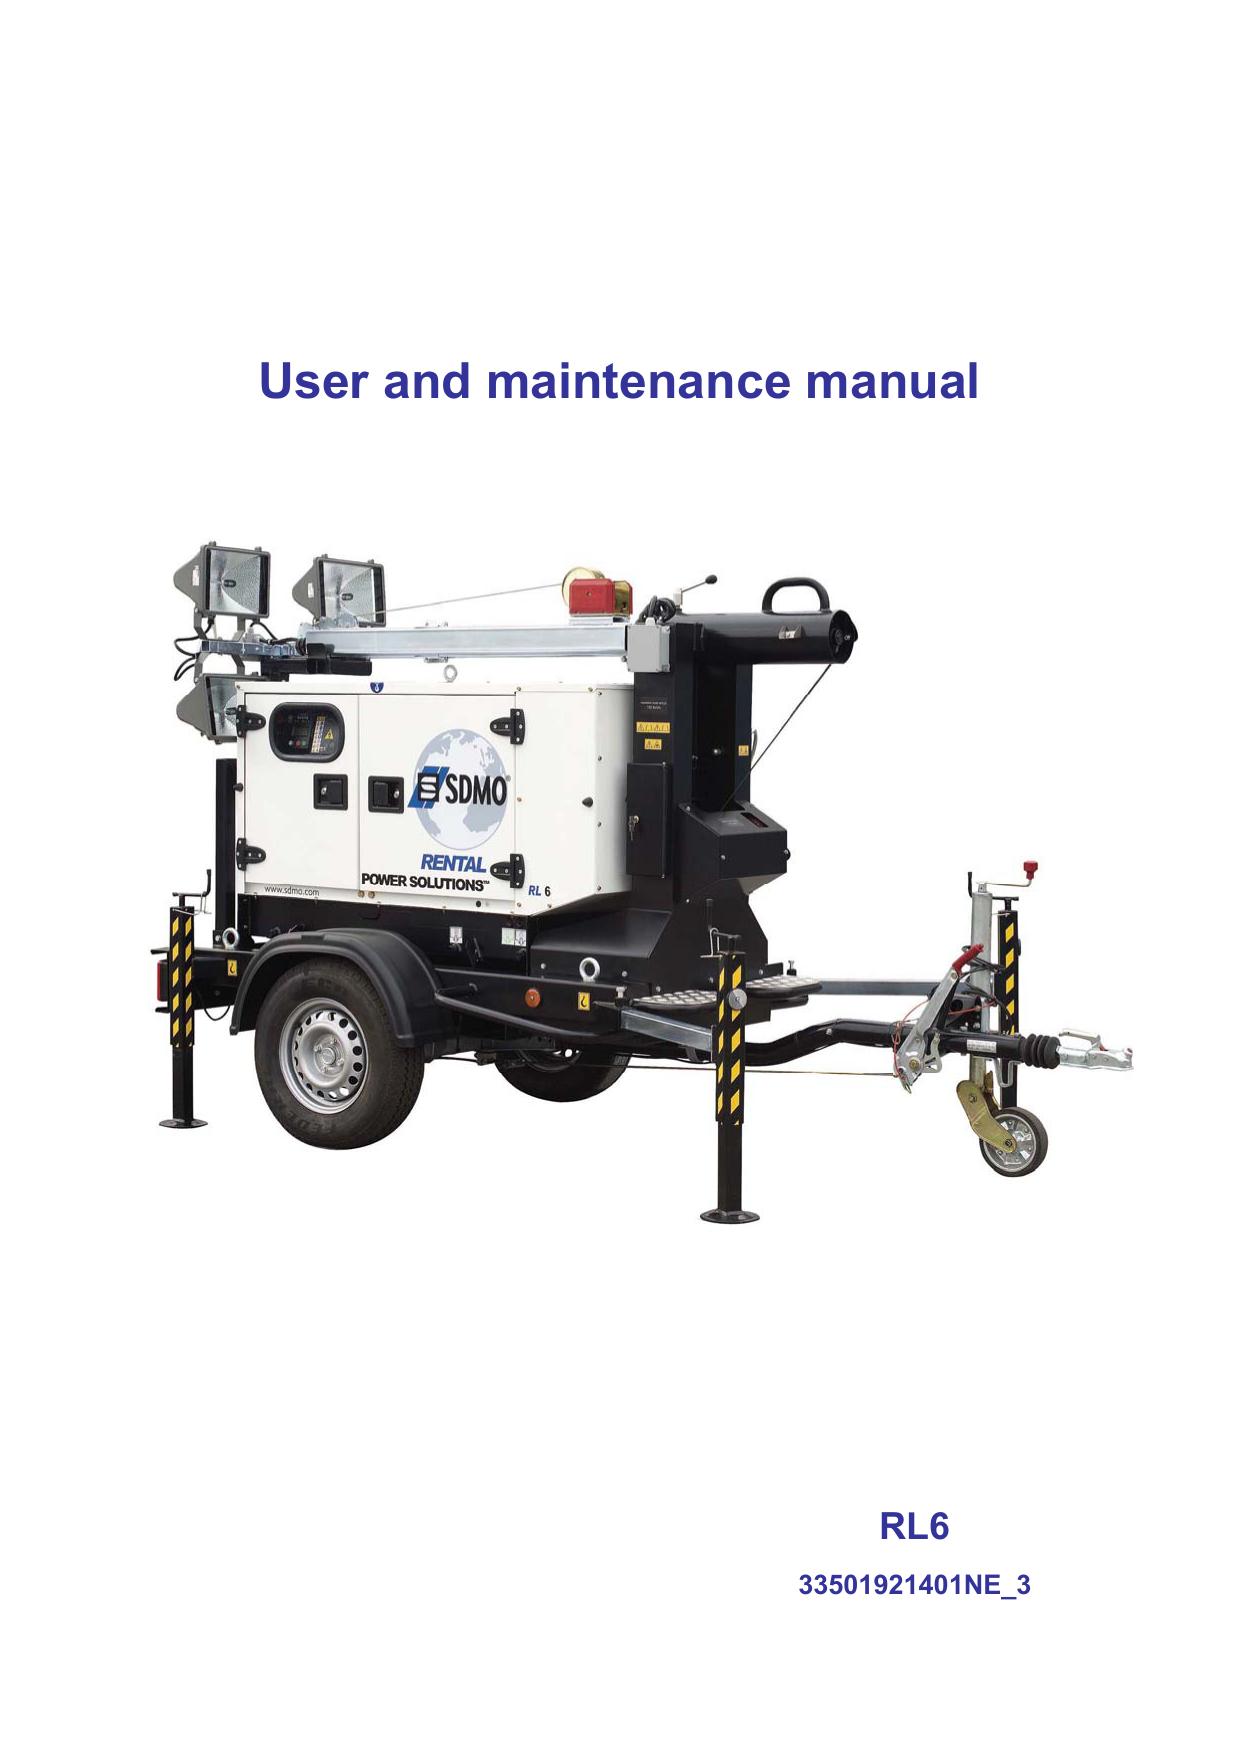 Four Air Pulsé Ou Chaleur Tournante user and maintenance manual | manualzz